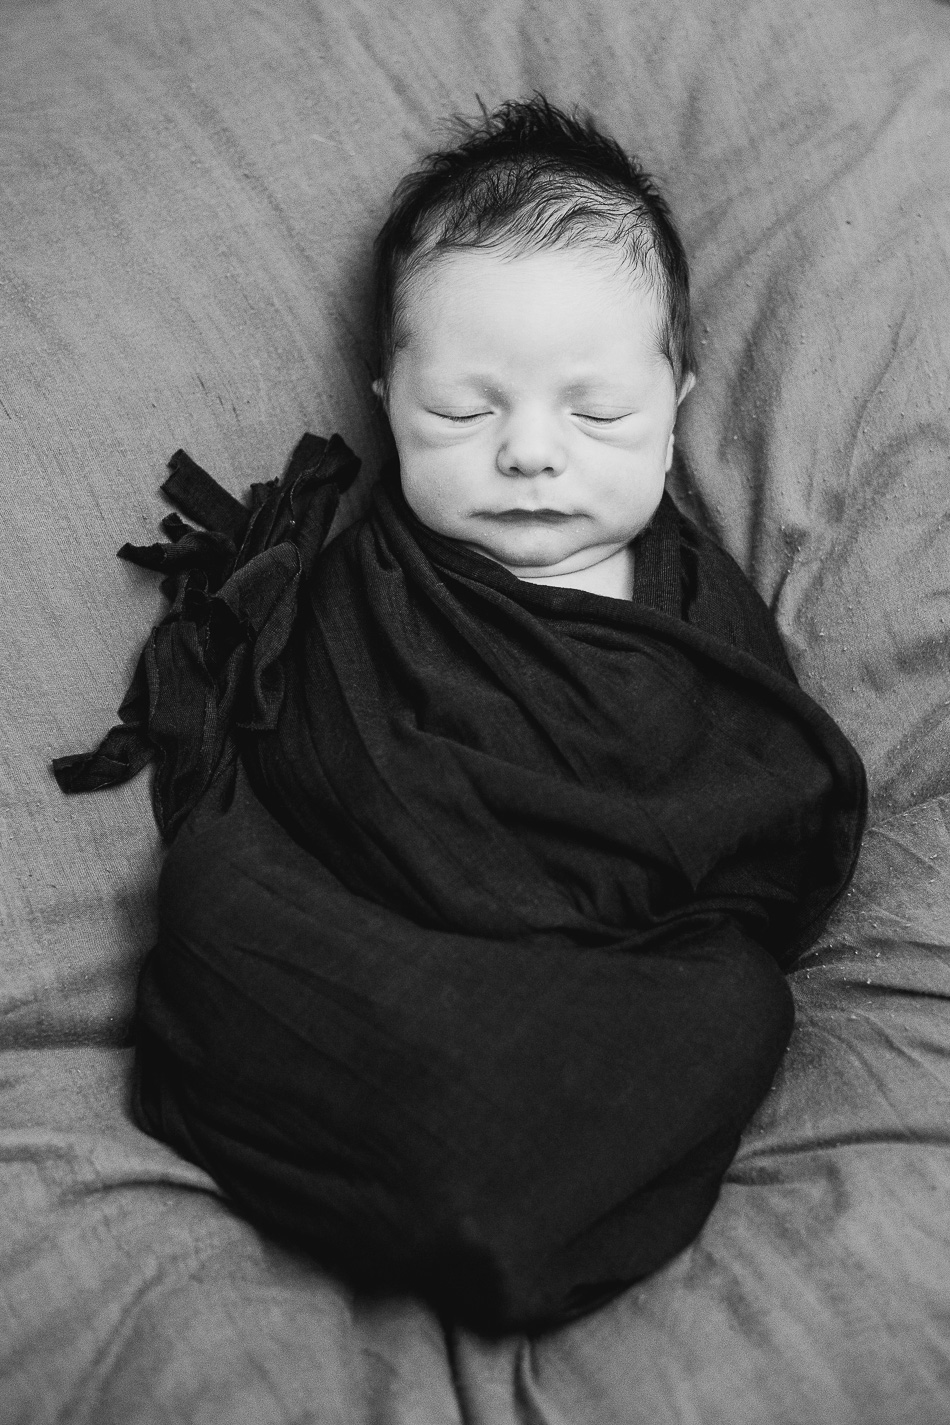 fotograf profesionist fotografie de familie newborn nou nascut targu mures nunta botez familie licentiat doctorand maternitate